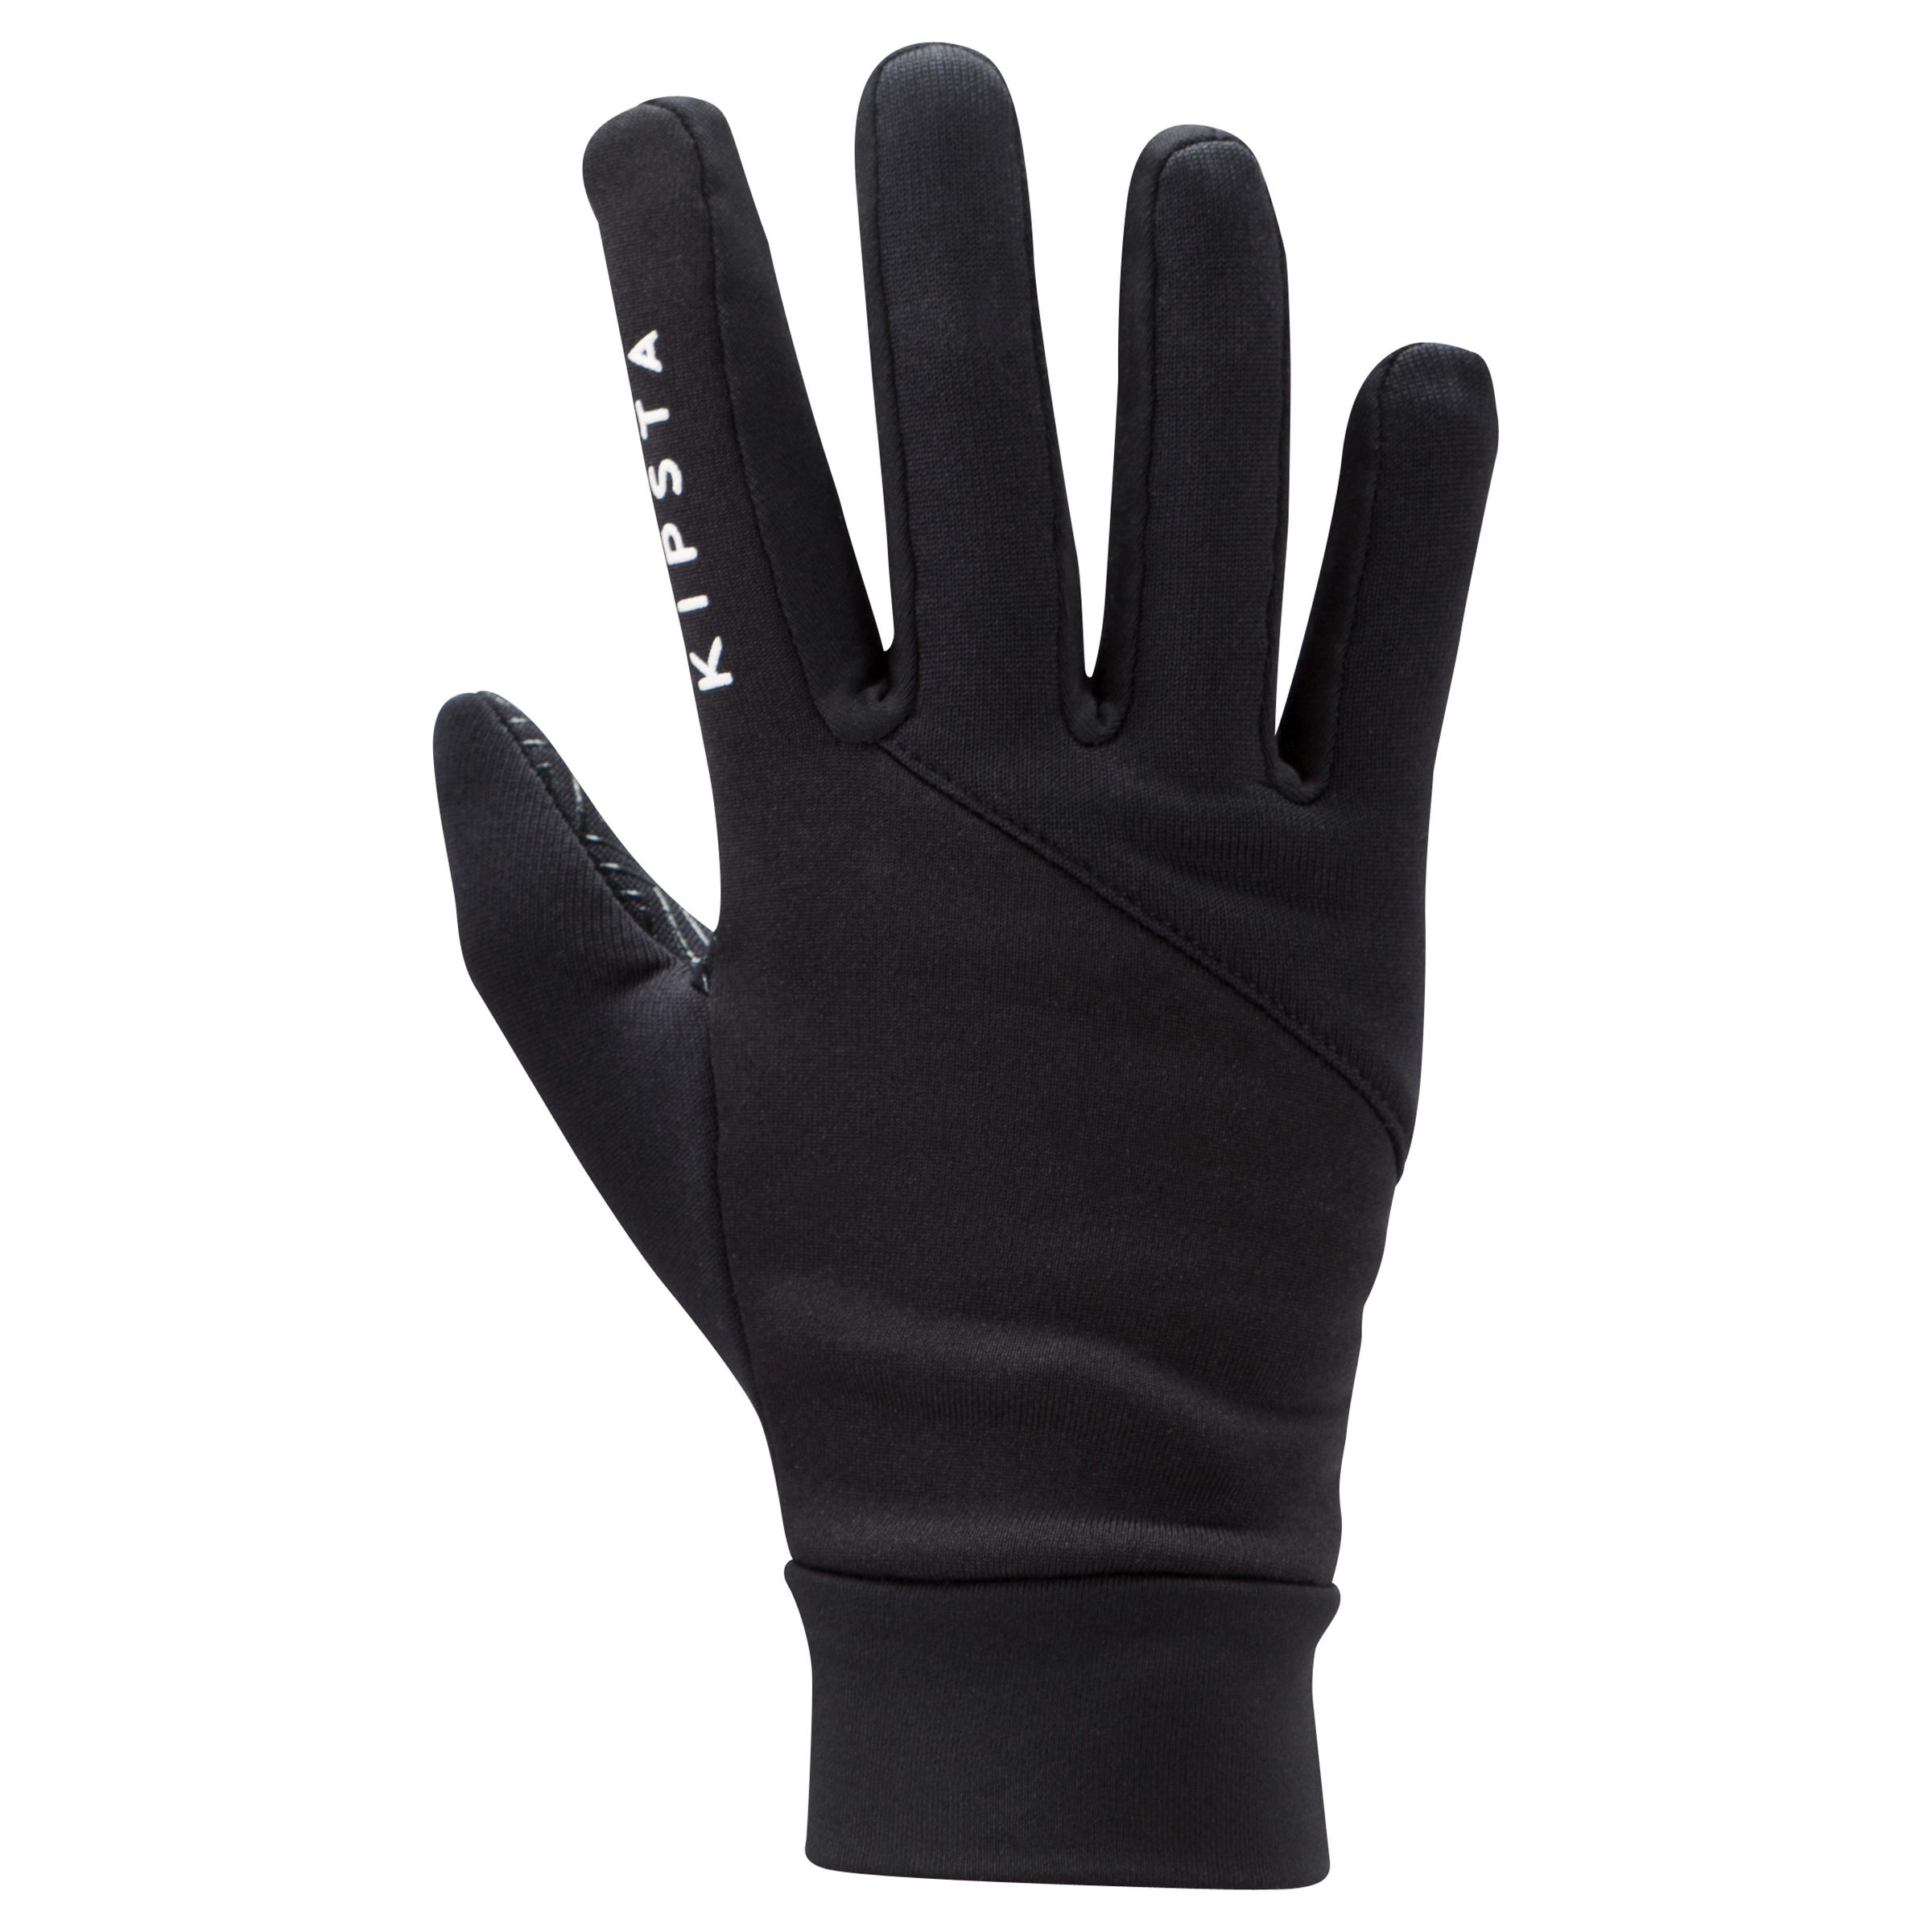 Keepwarm Kids' Warm & Water-Repellent Gloves - Black